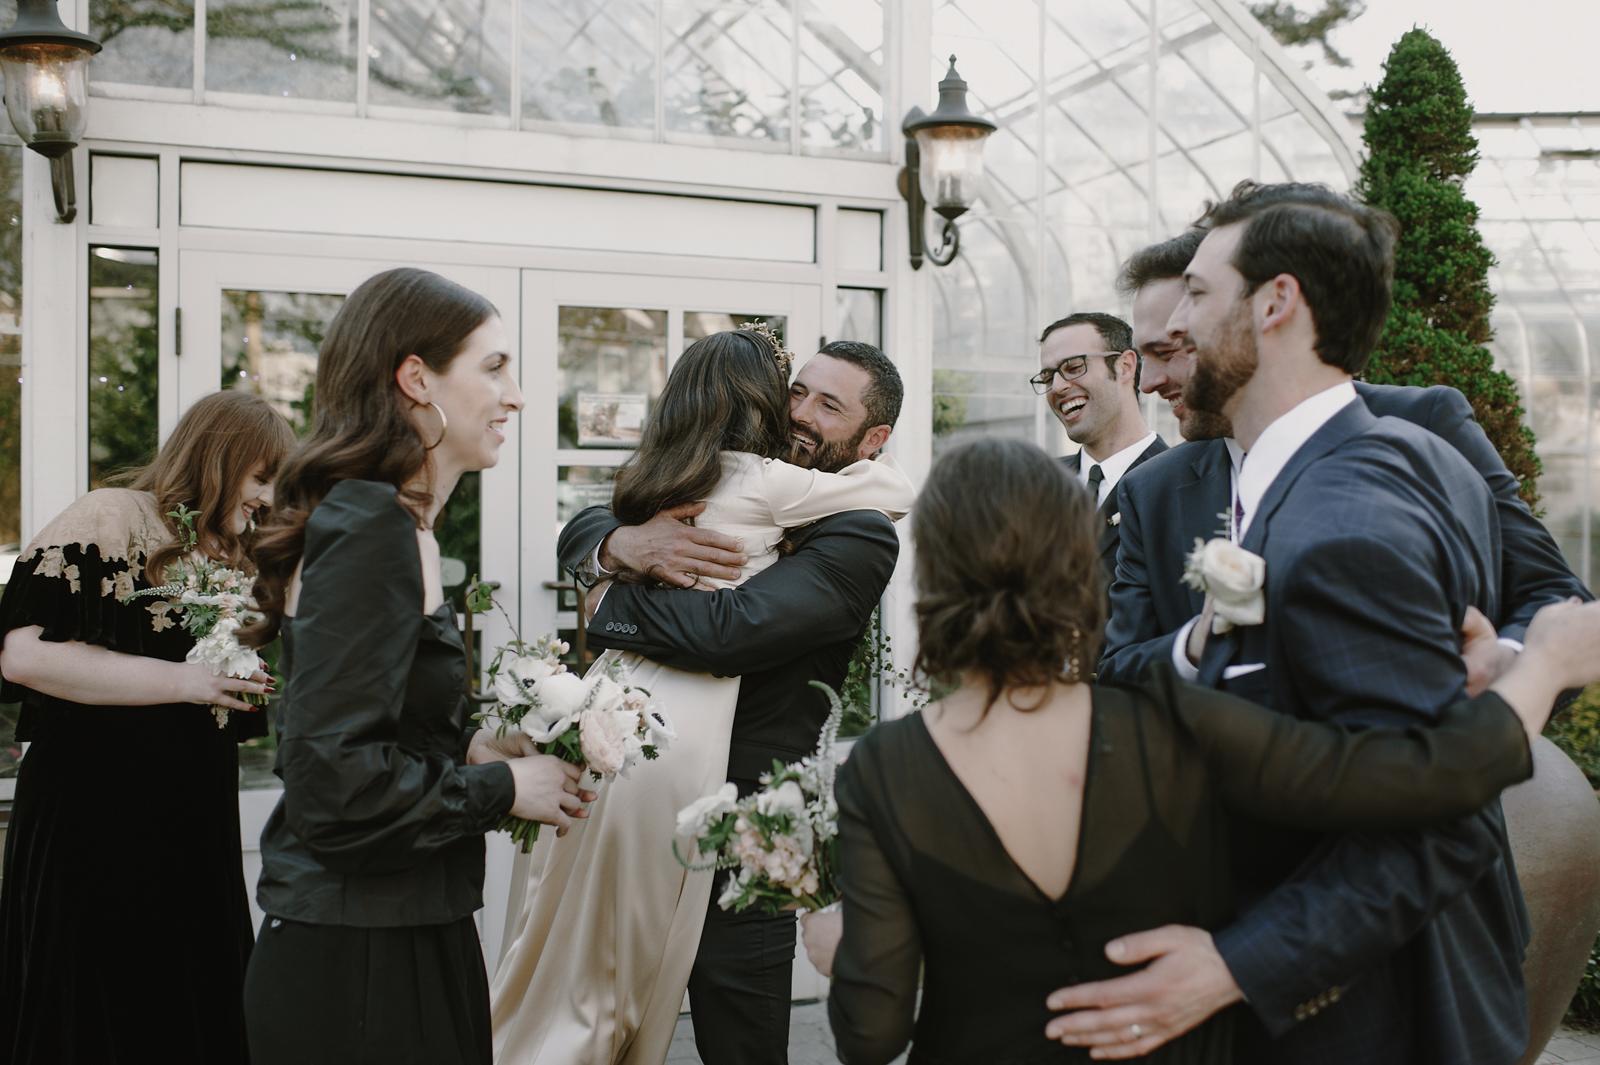 kristenmarieparker_tacoma_conservatory_warehouse_wedding052.JPG